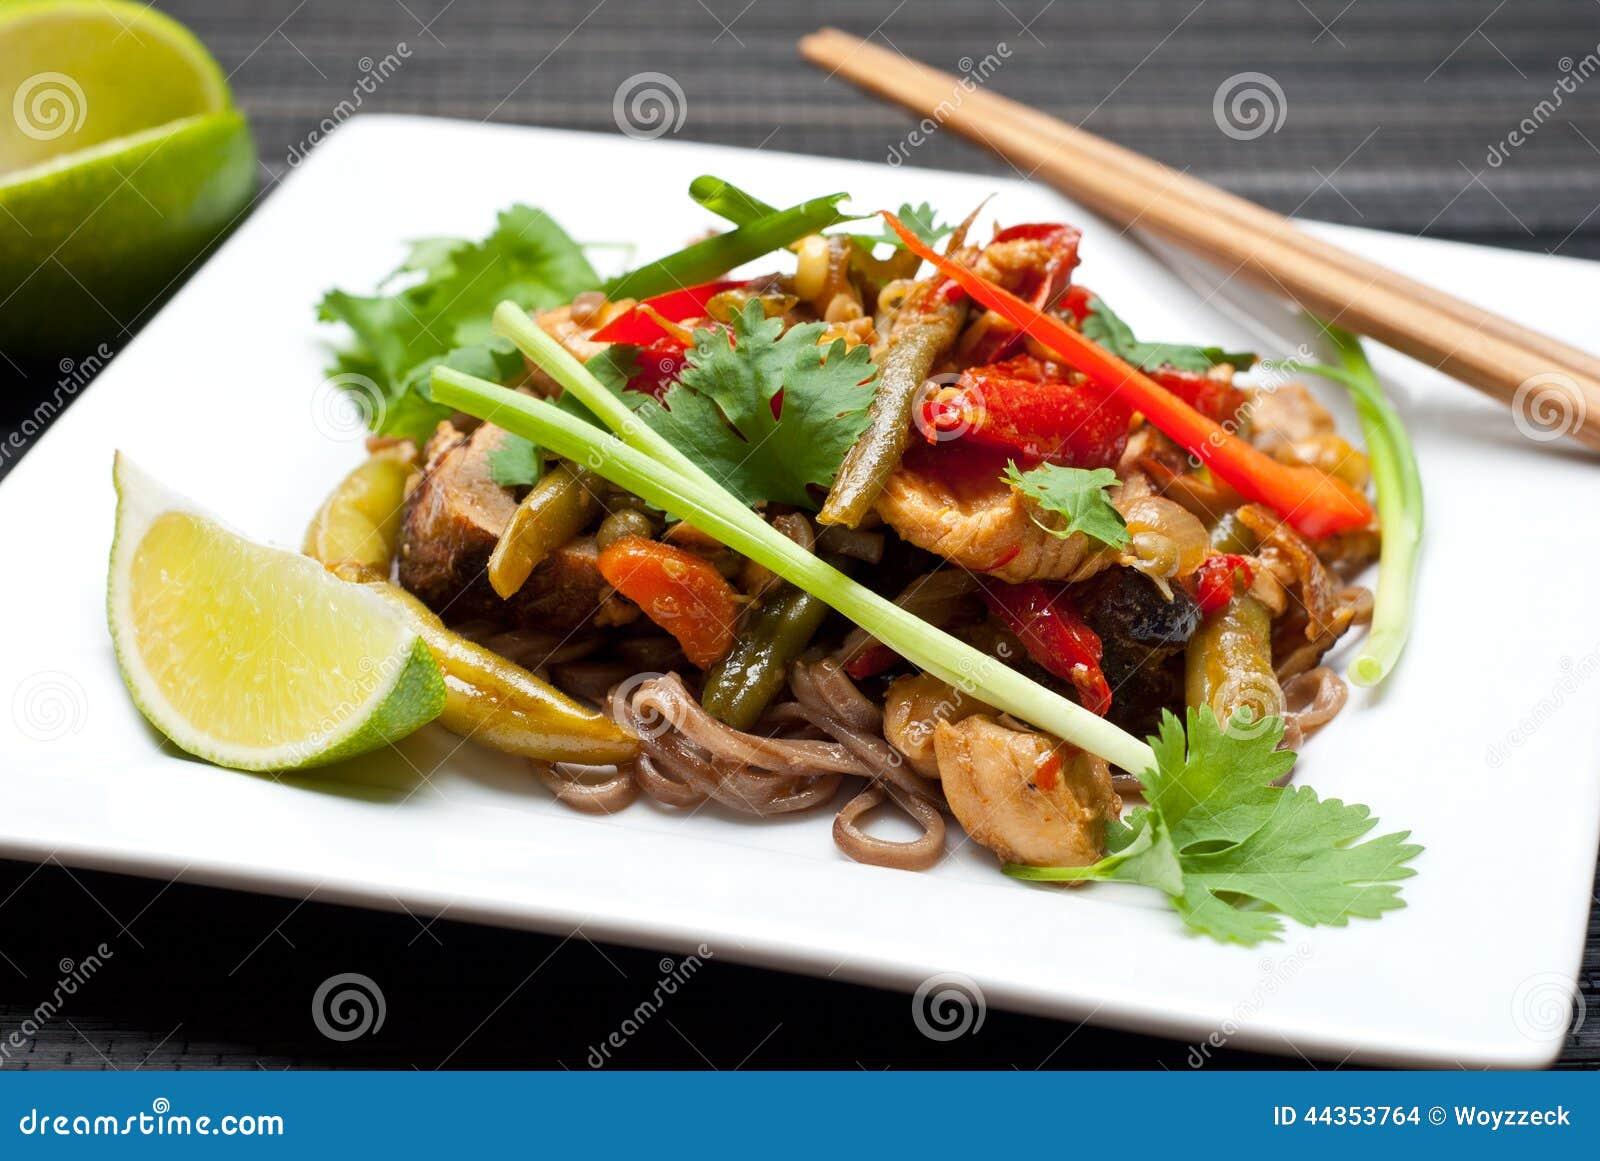 Rilievo tailandese